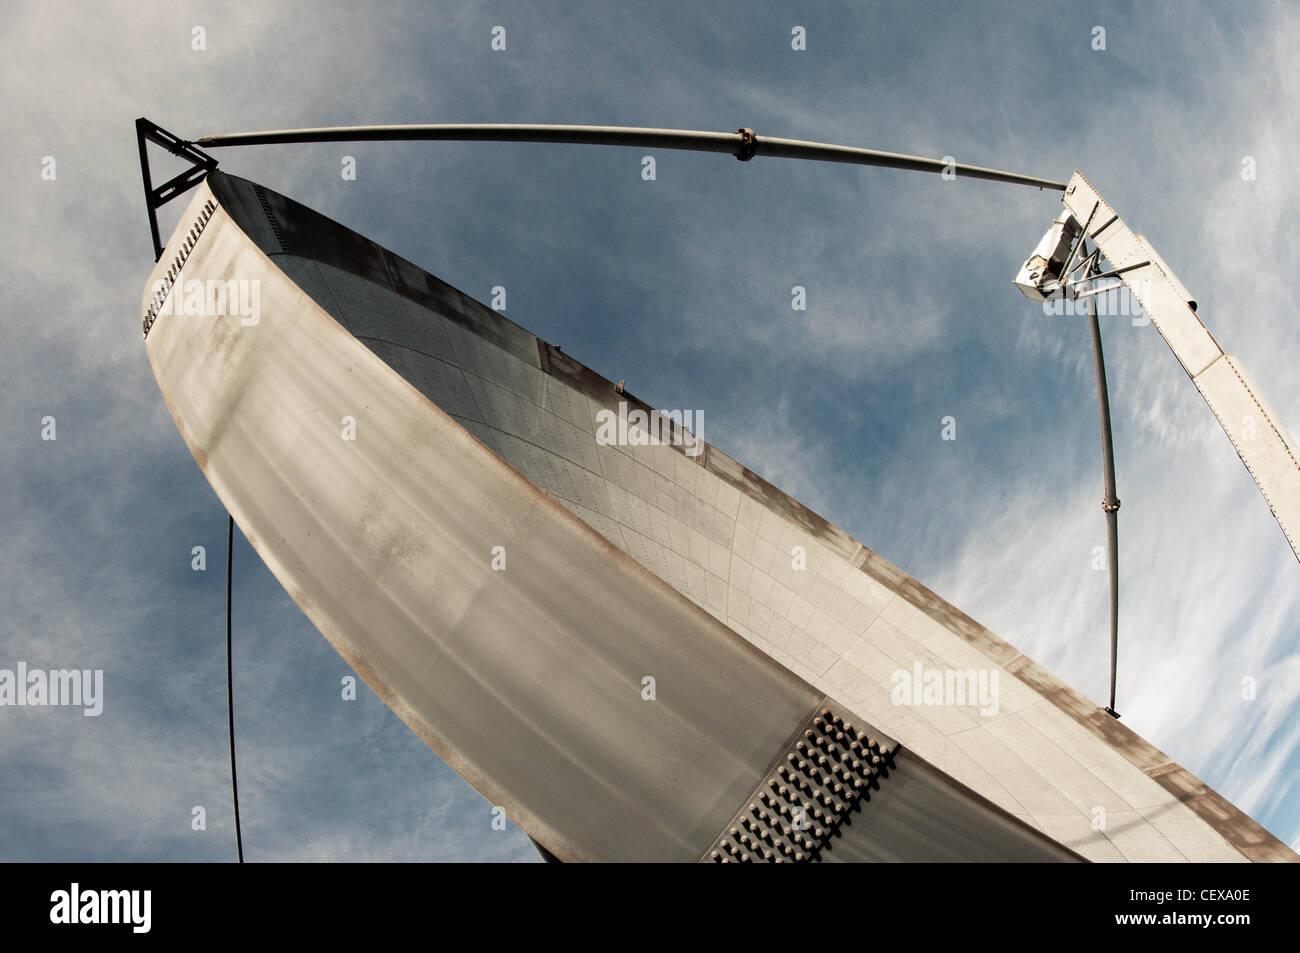 Antenne Sat-radar Stockbild